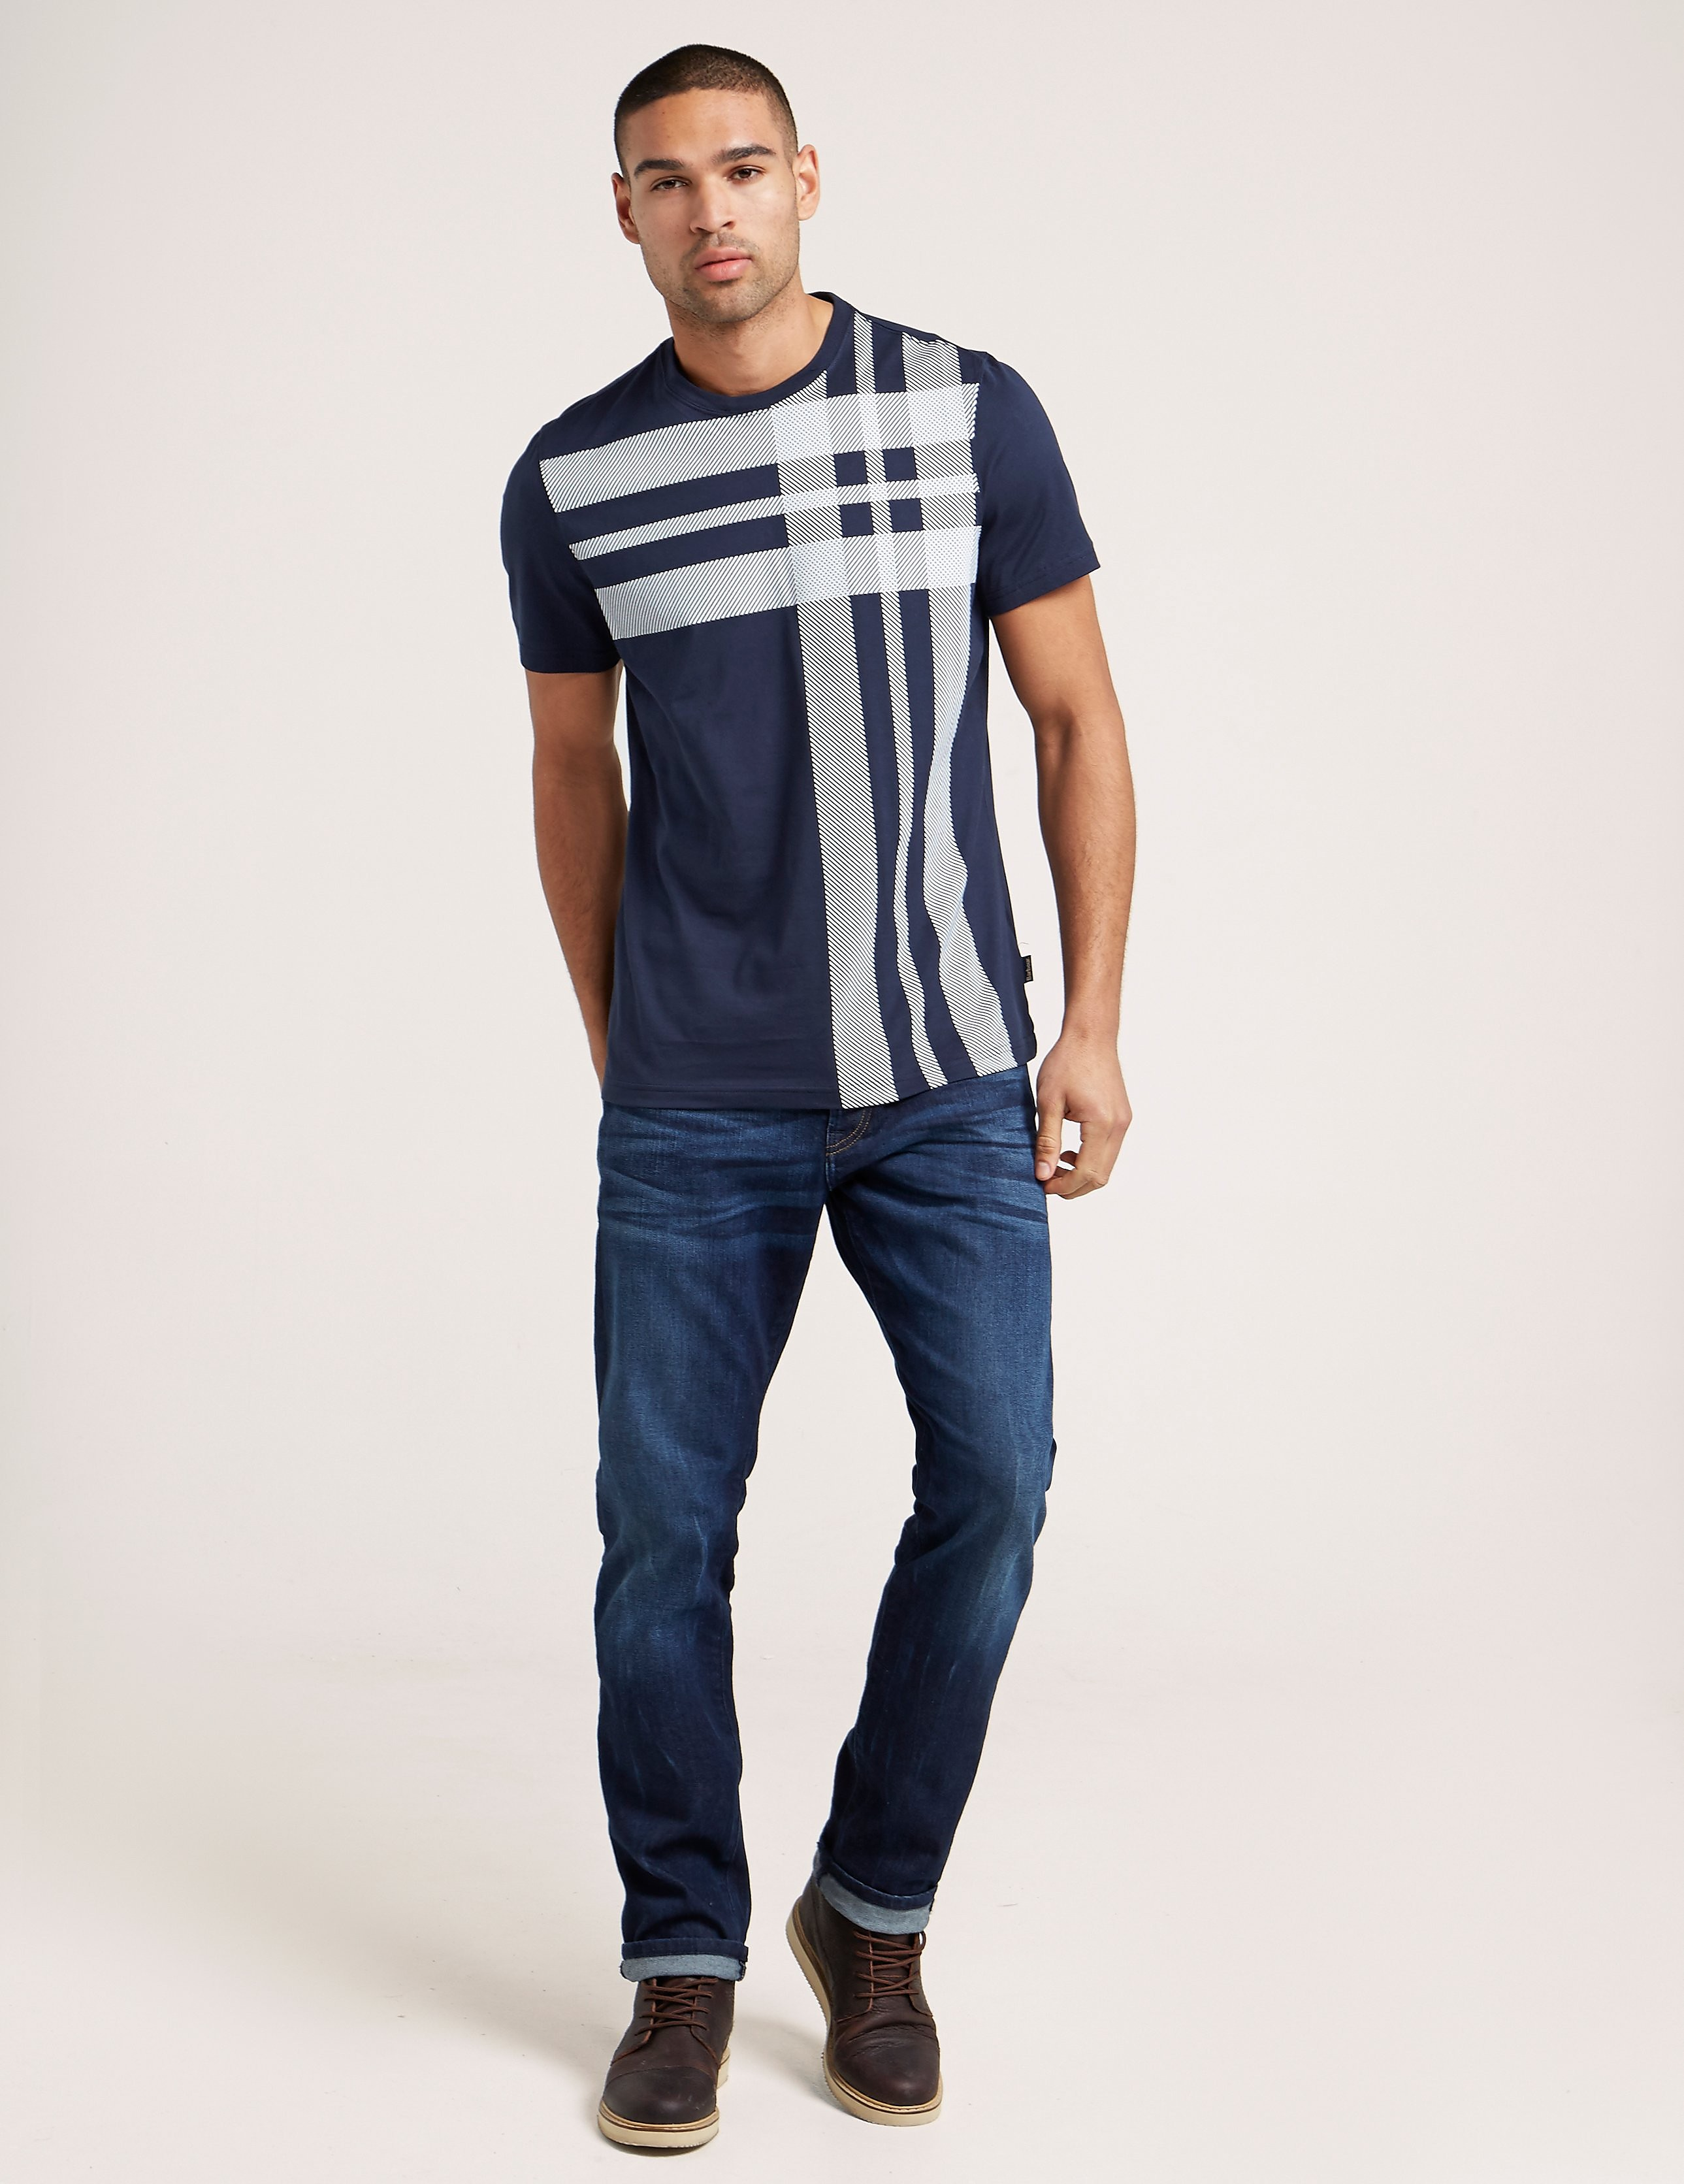 Barbour Bank Short Sleeve T-Shirt